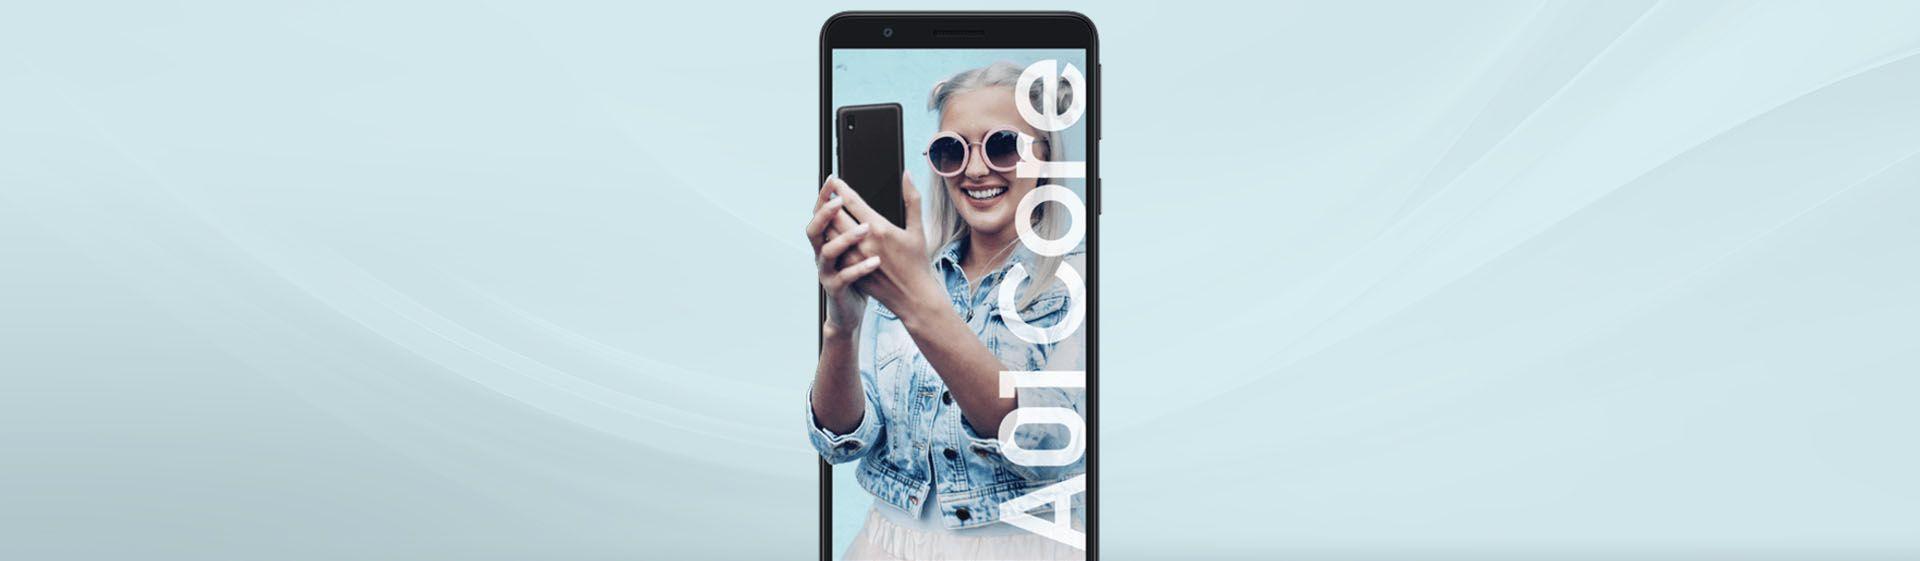 A01 Core: leia a análise de ficha técnica do  Samsung